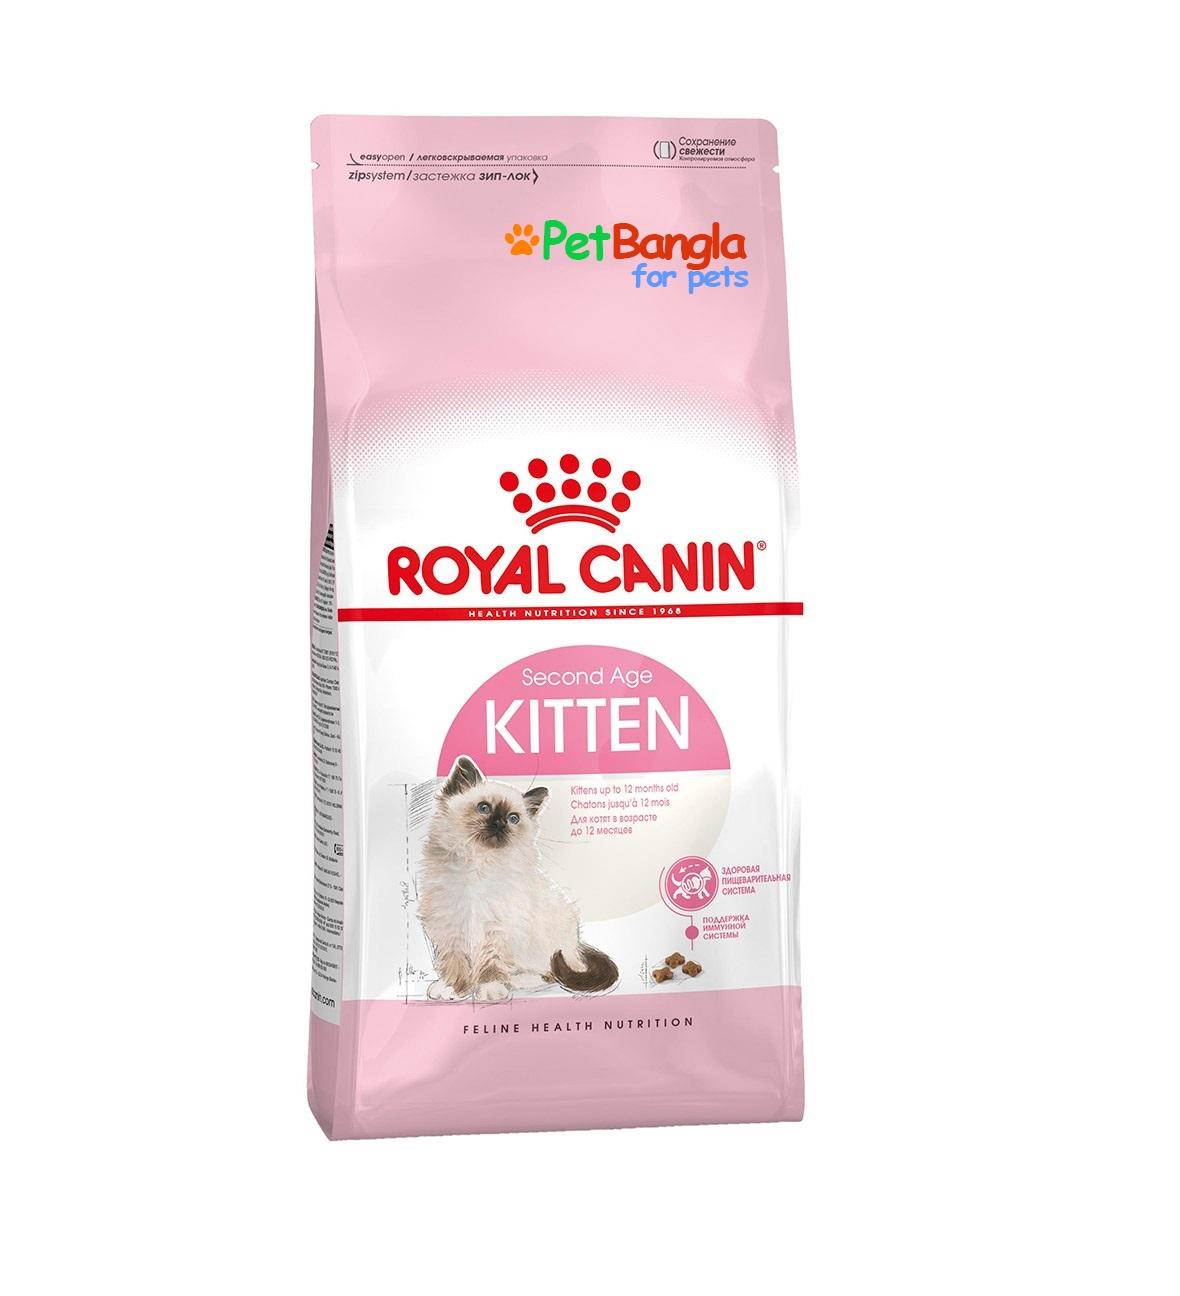 Royal Canin Kitten 2kg Pet Bangla